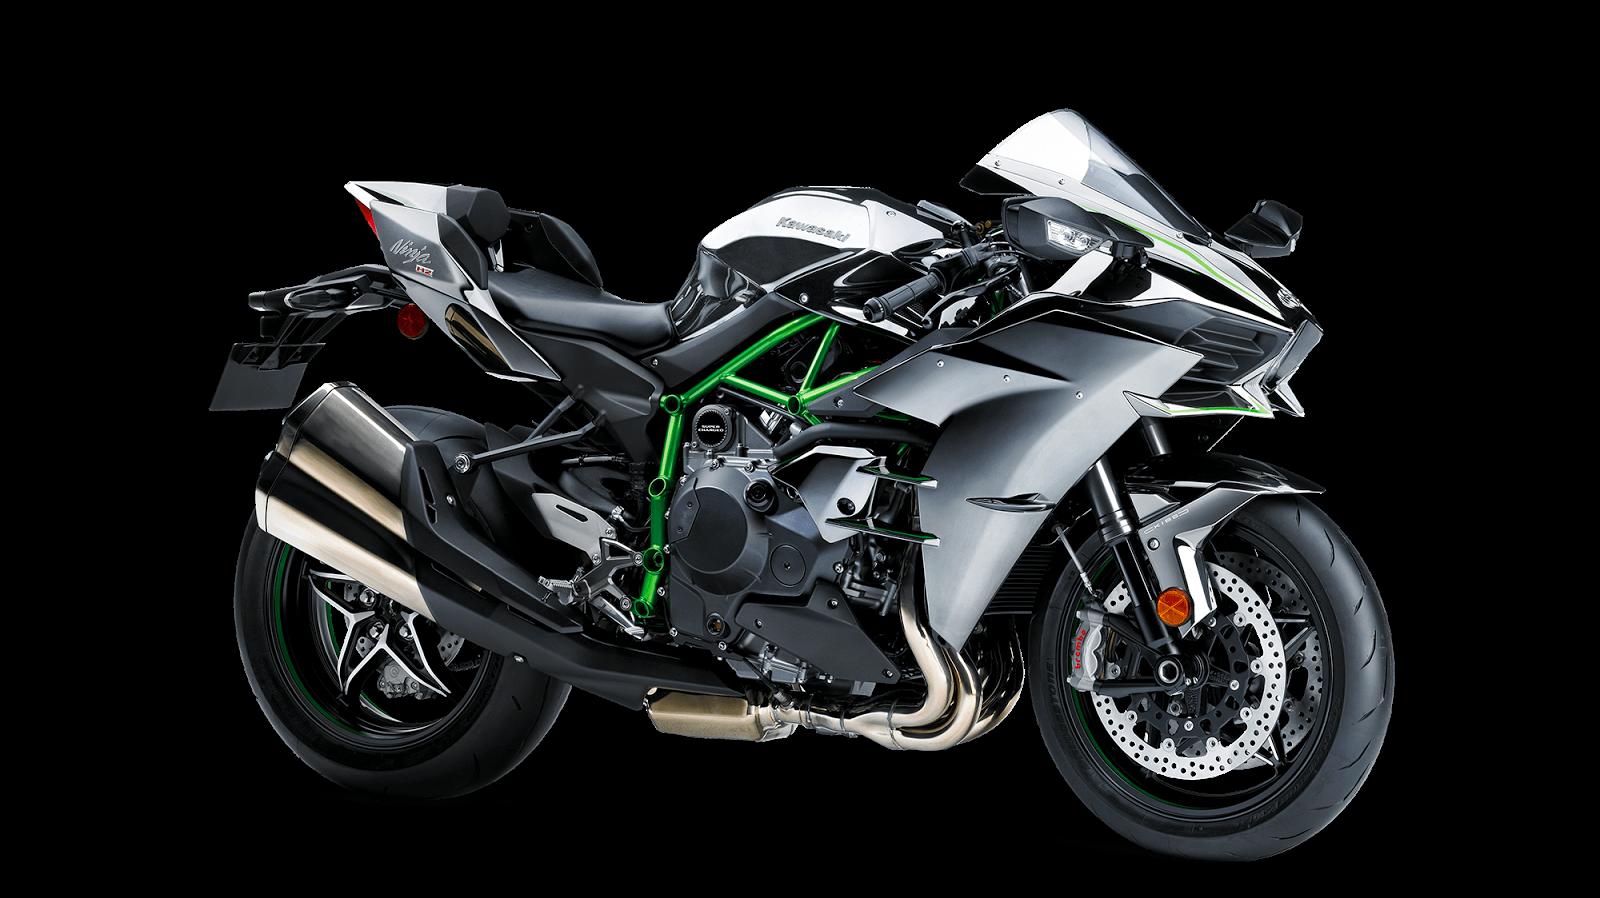 Kawasaki Ninja H2 - Road Legal Supercharged Bike